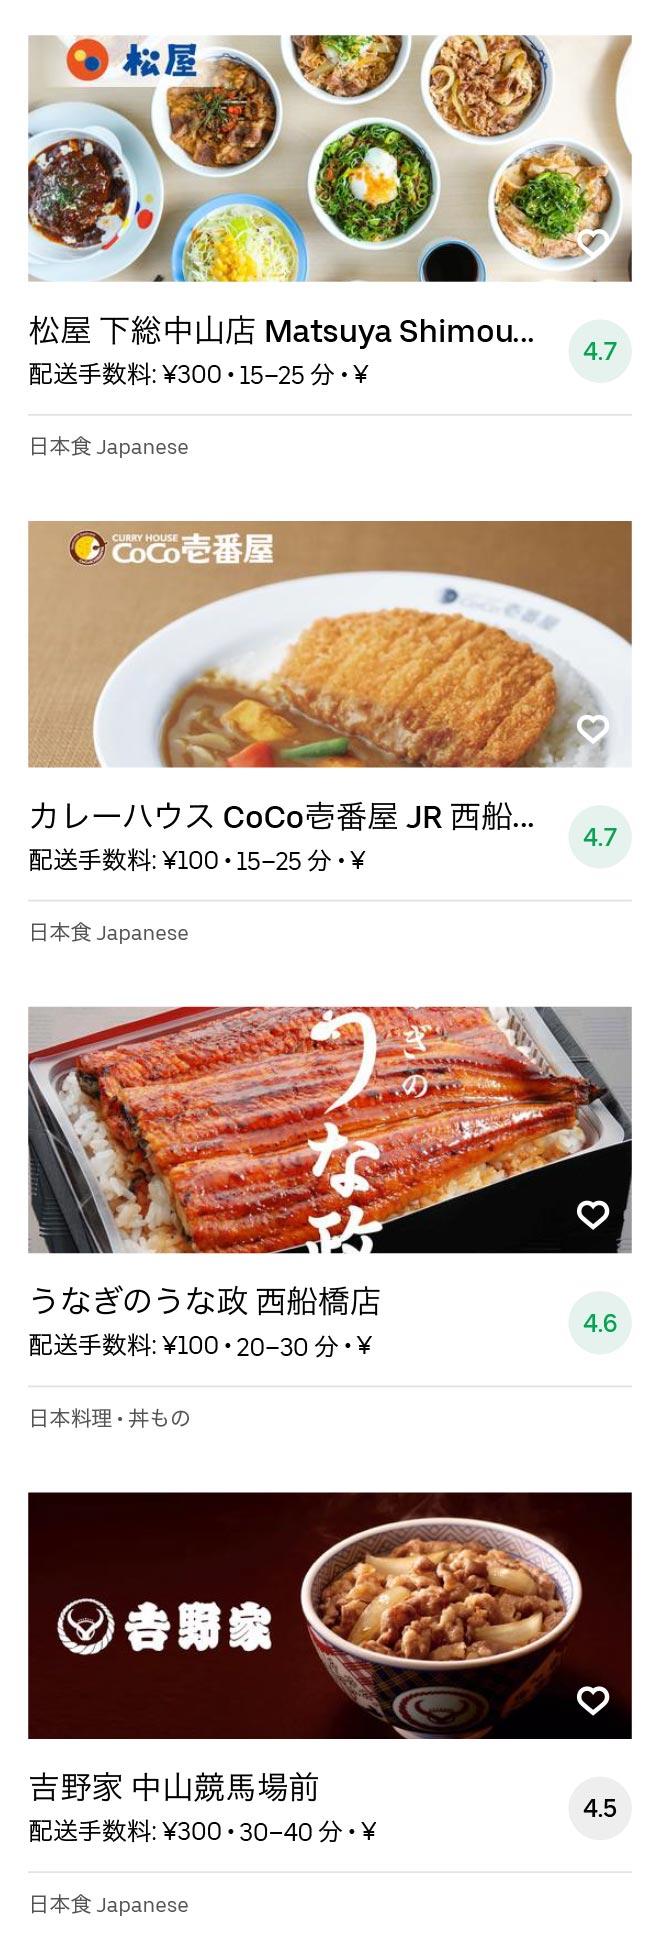 Nishi funabashi menu 2008 06